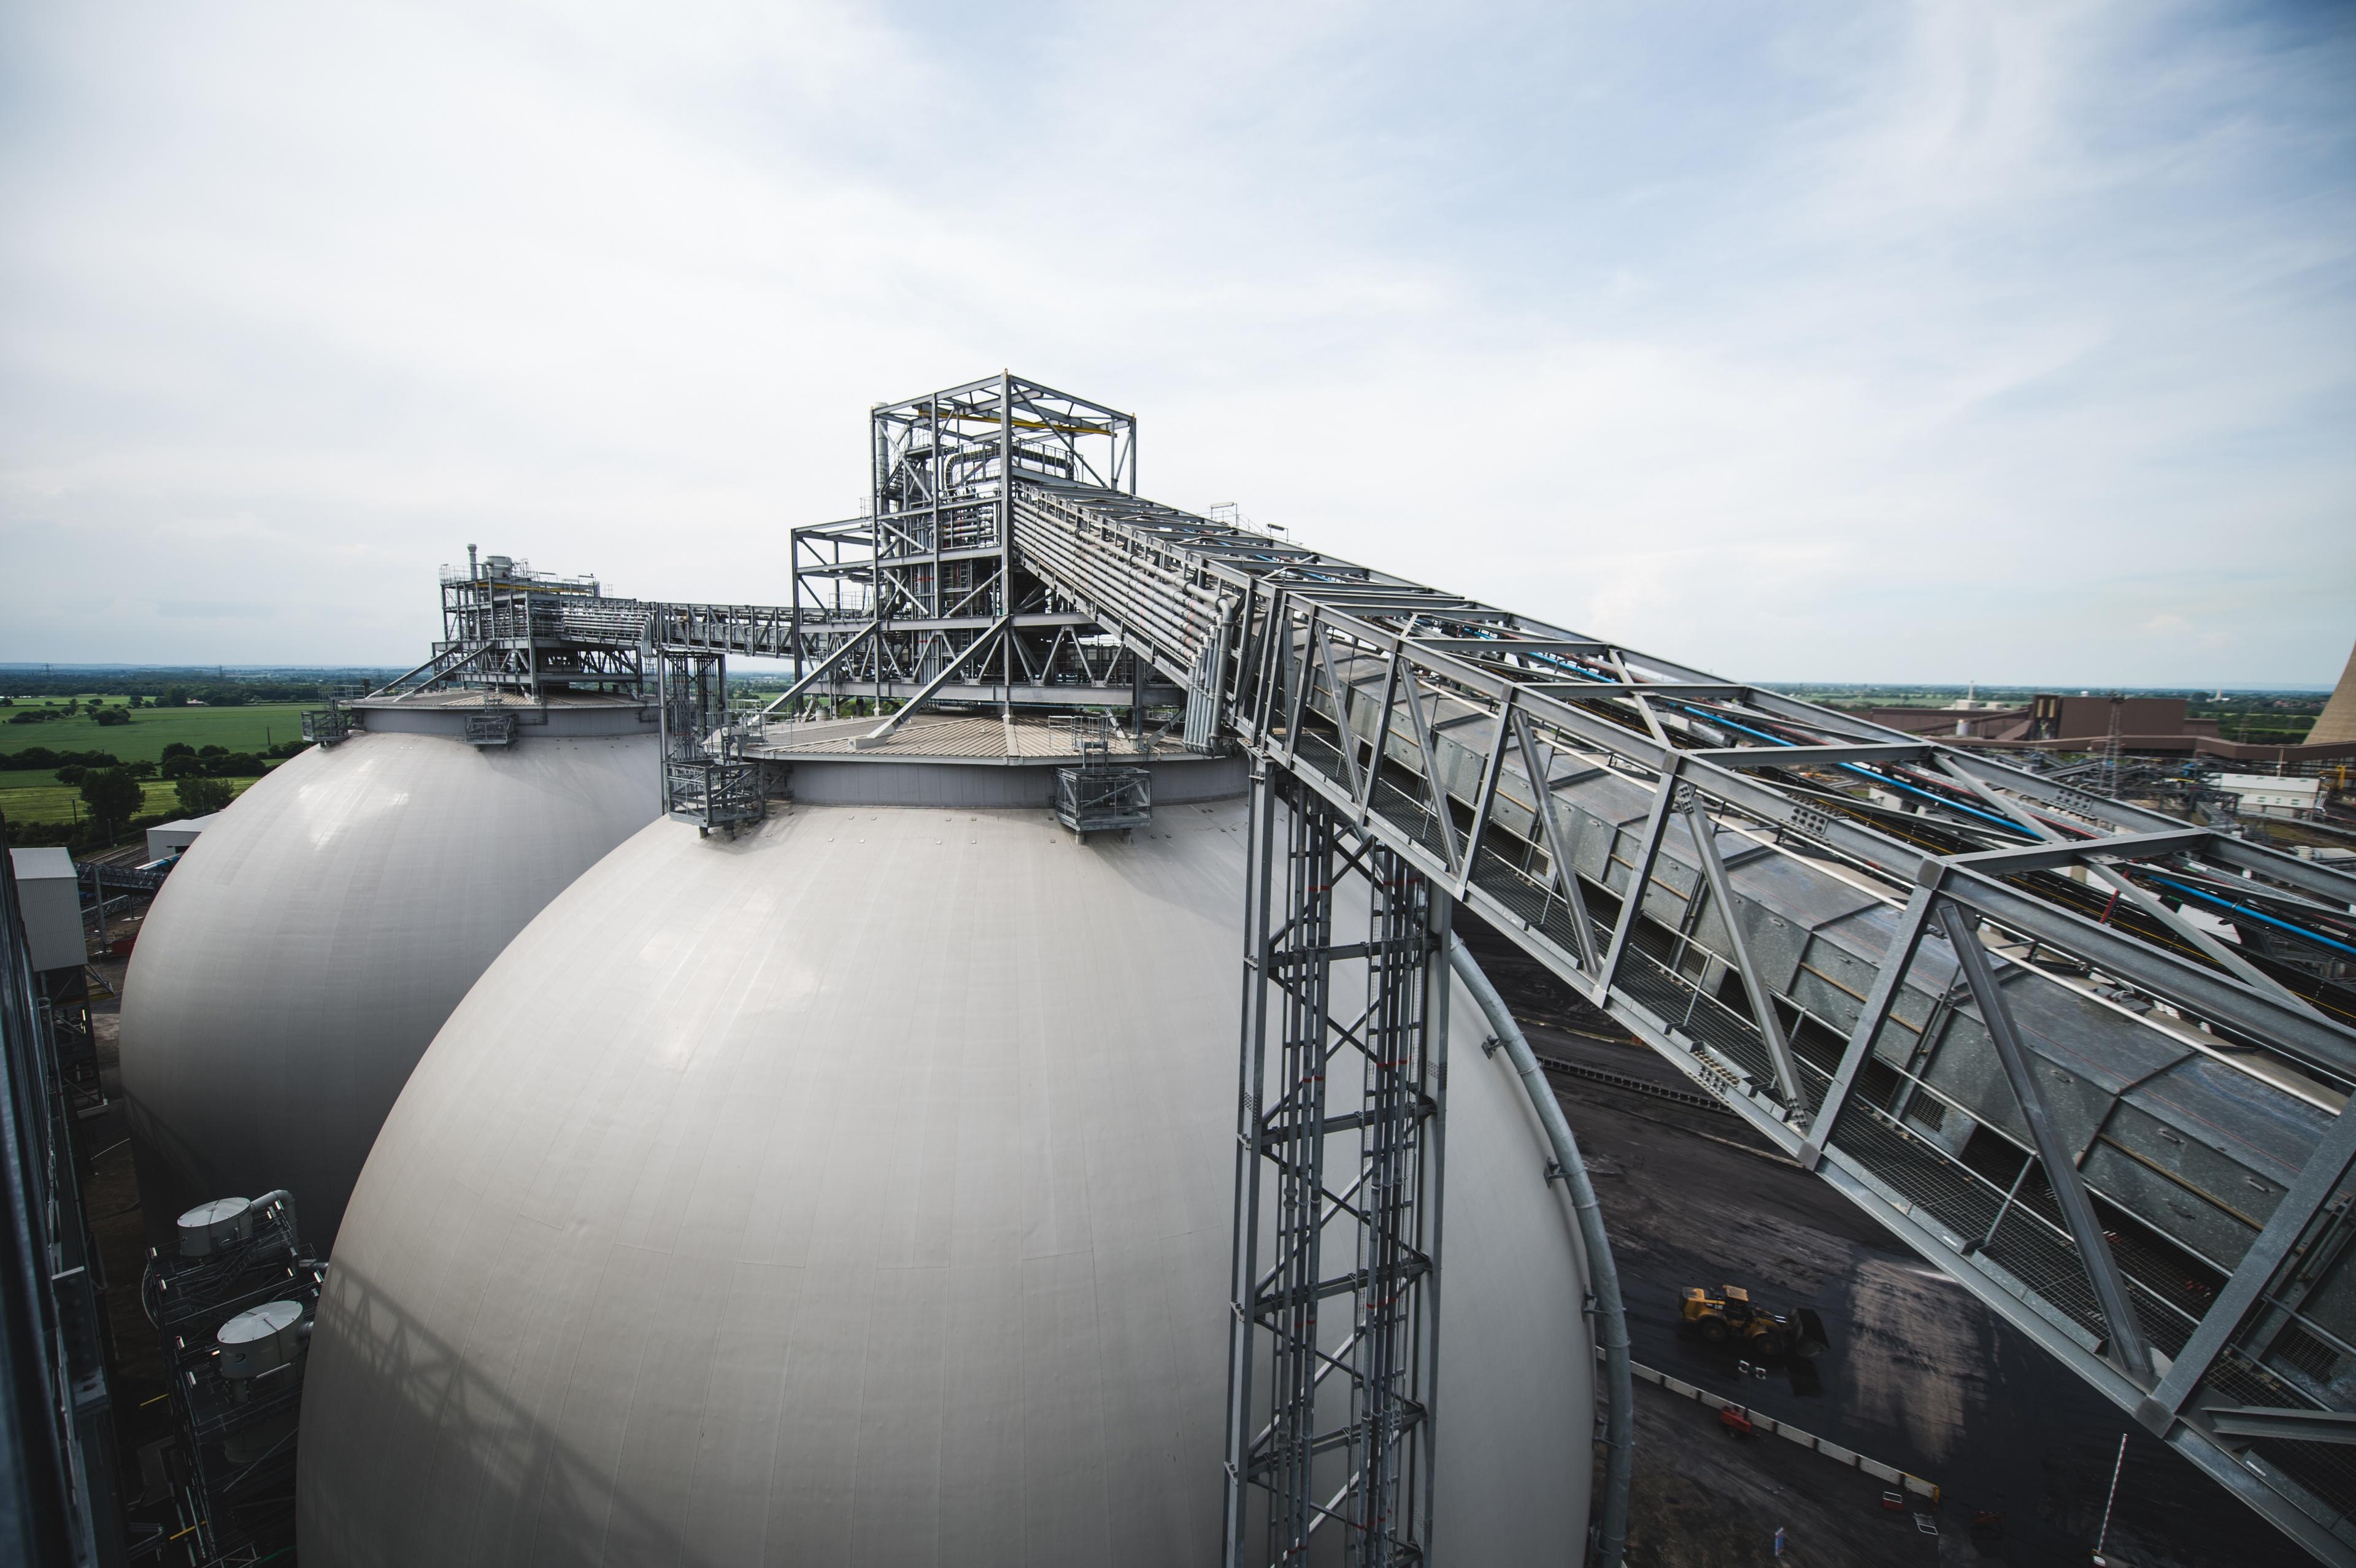 Drax Power One Step Closer to a Coal-Free Future